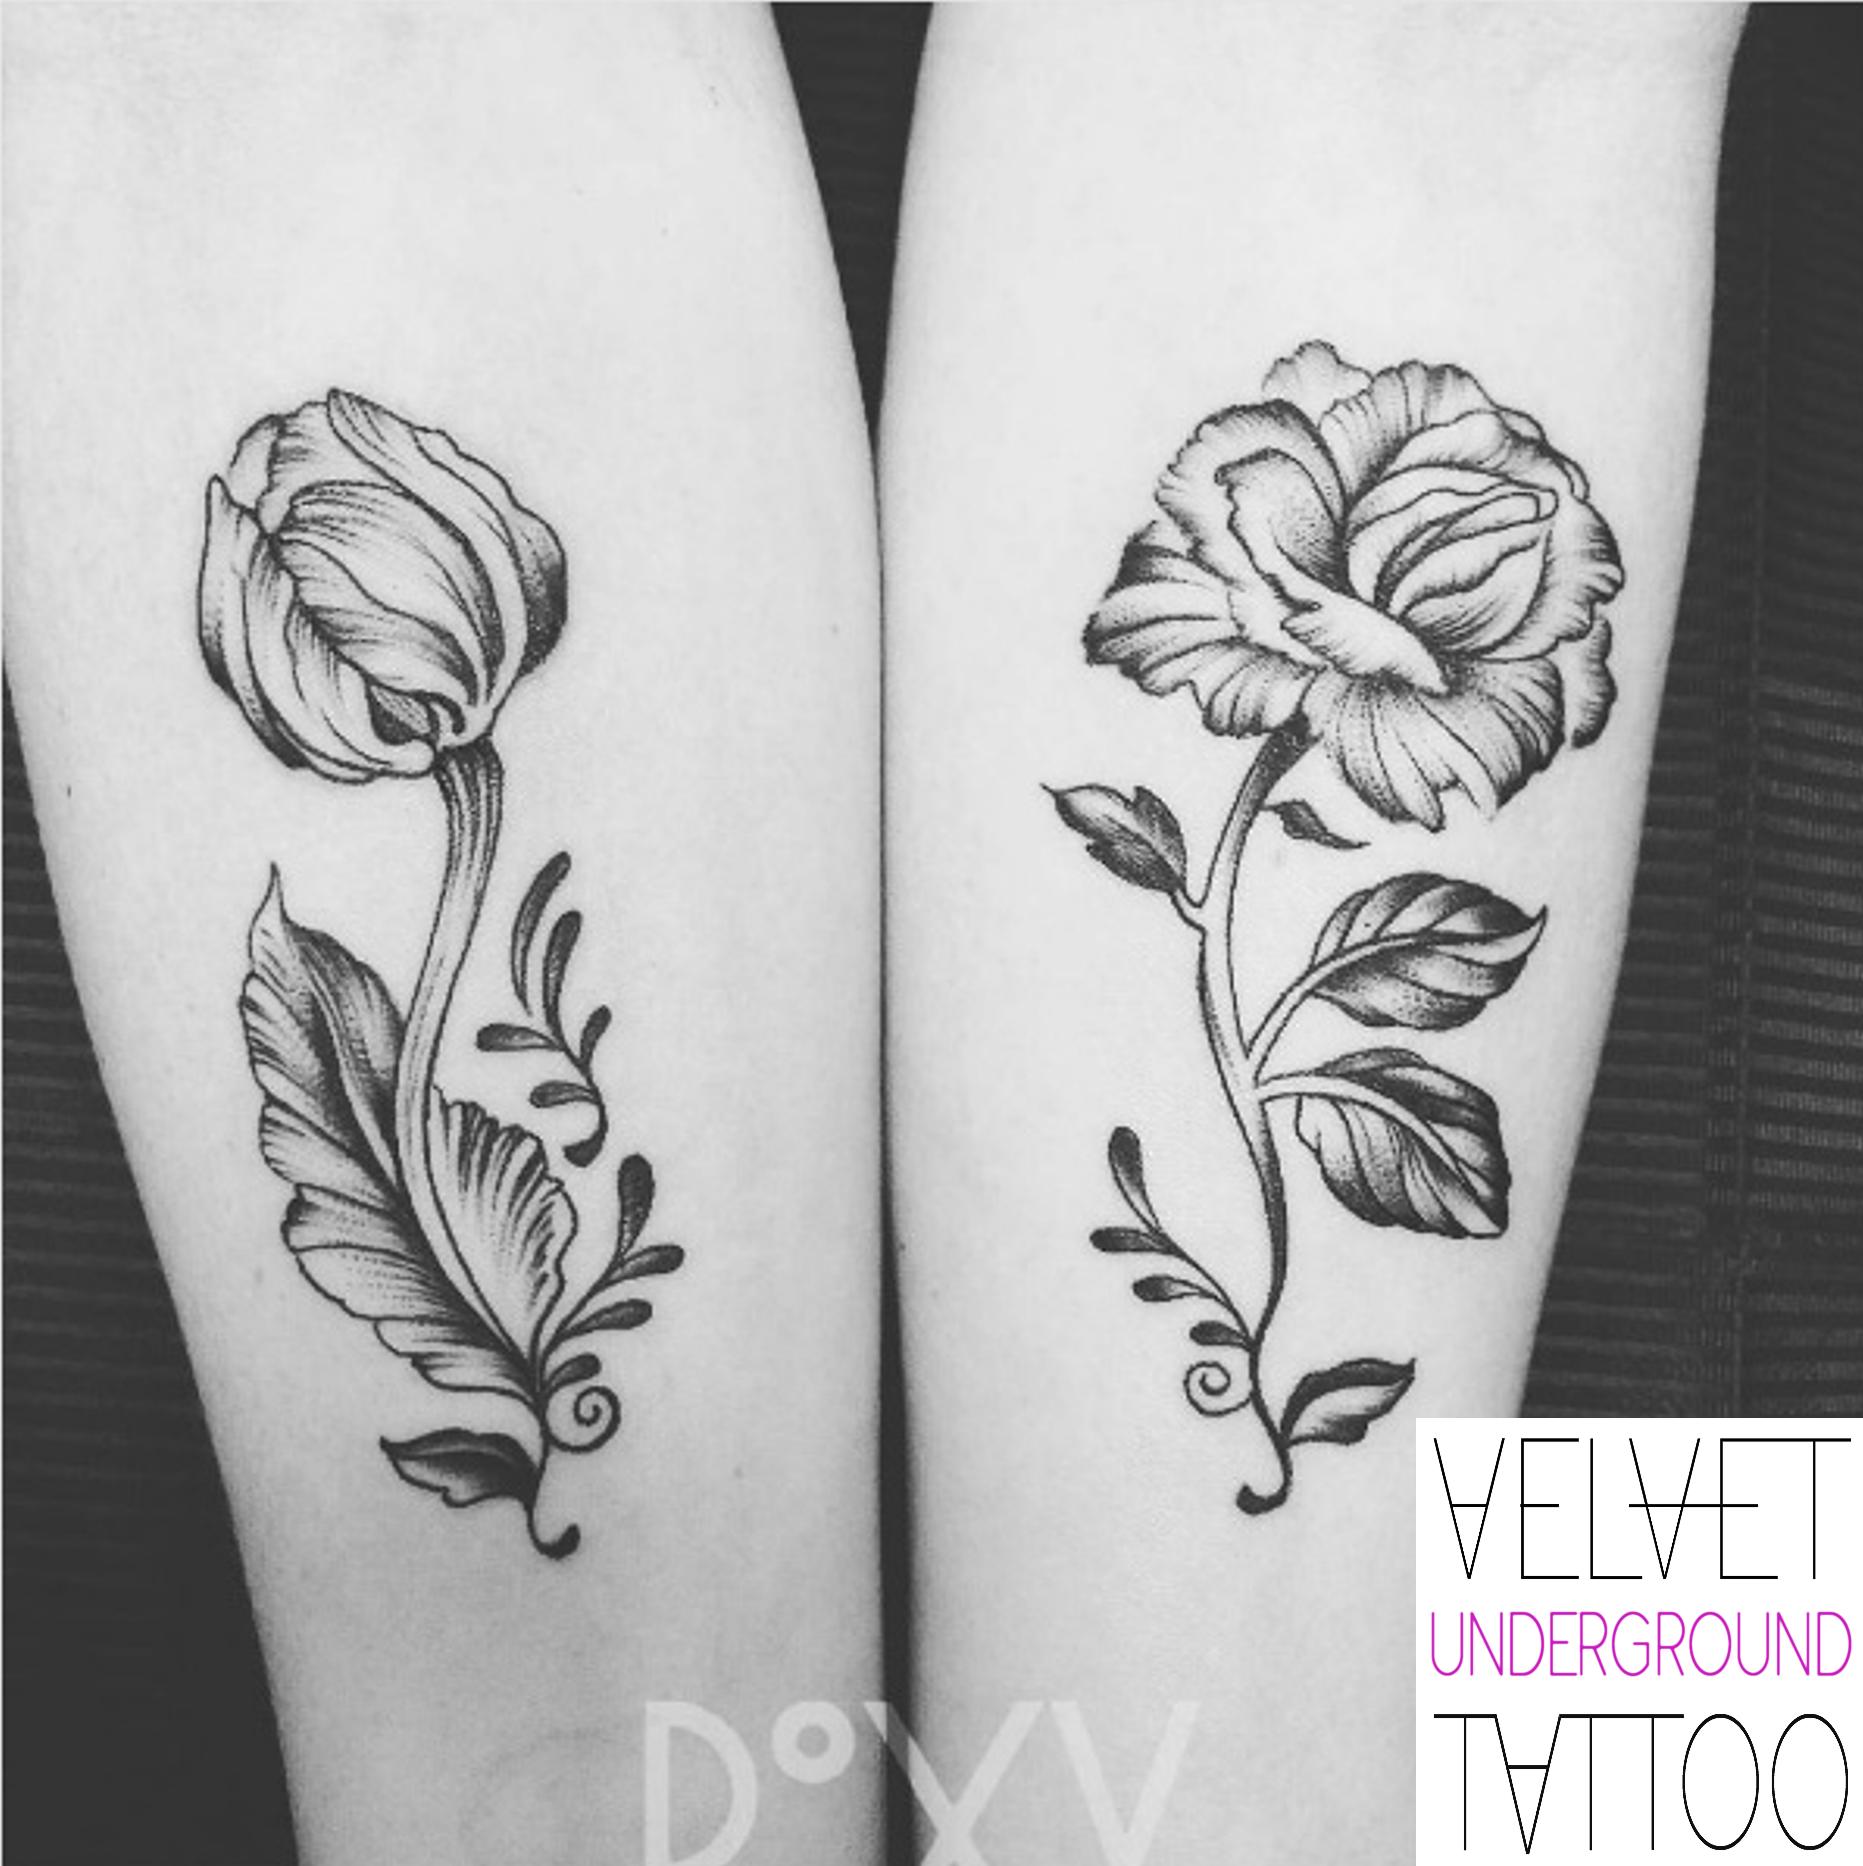 Matching Rose and Tulip Tattoos by Roxy Velvet at Velvet Underground Tattoo